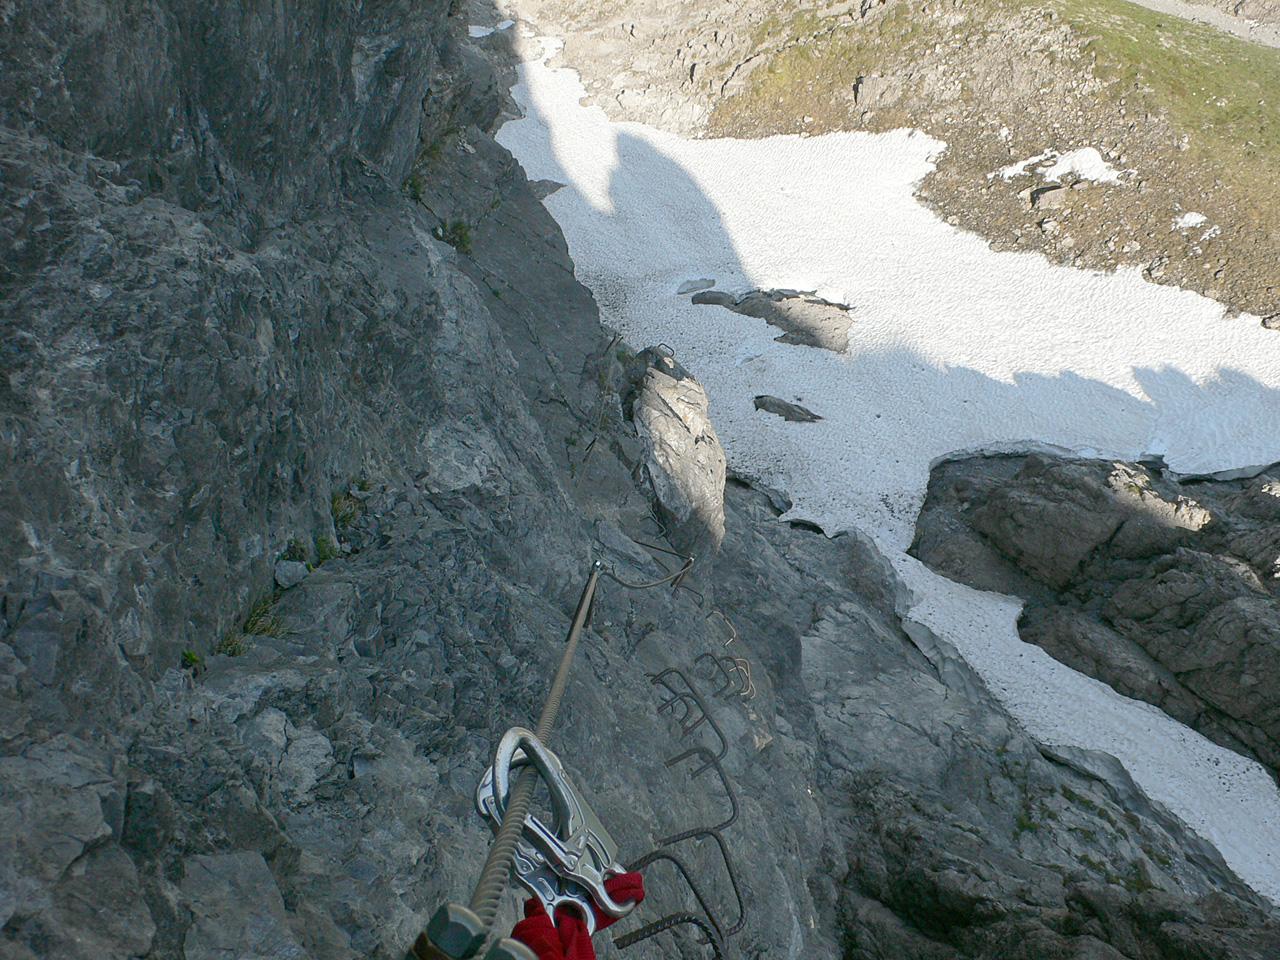 Klettersteig Saulakopf : Klettersteig saula ostwand